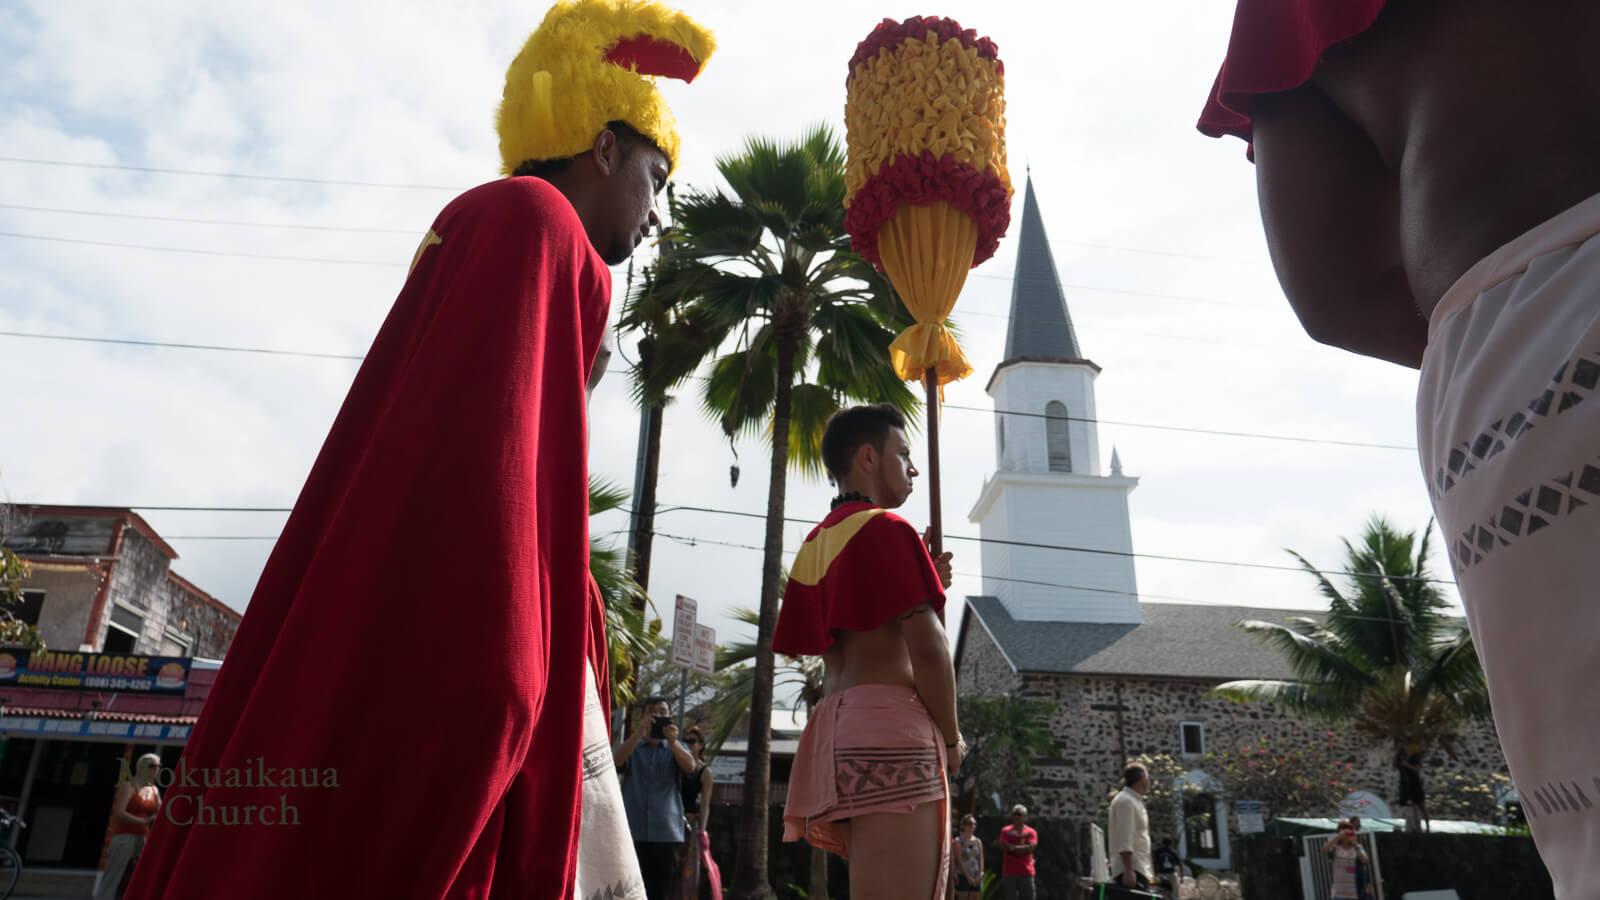 Mokuaikaua: Hawai'i's 1st Christian Church